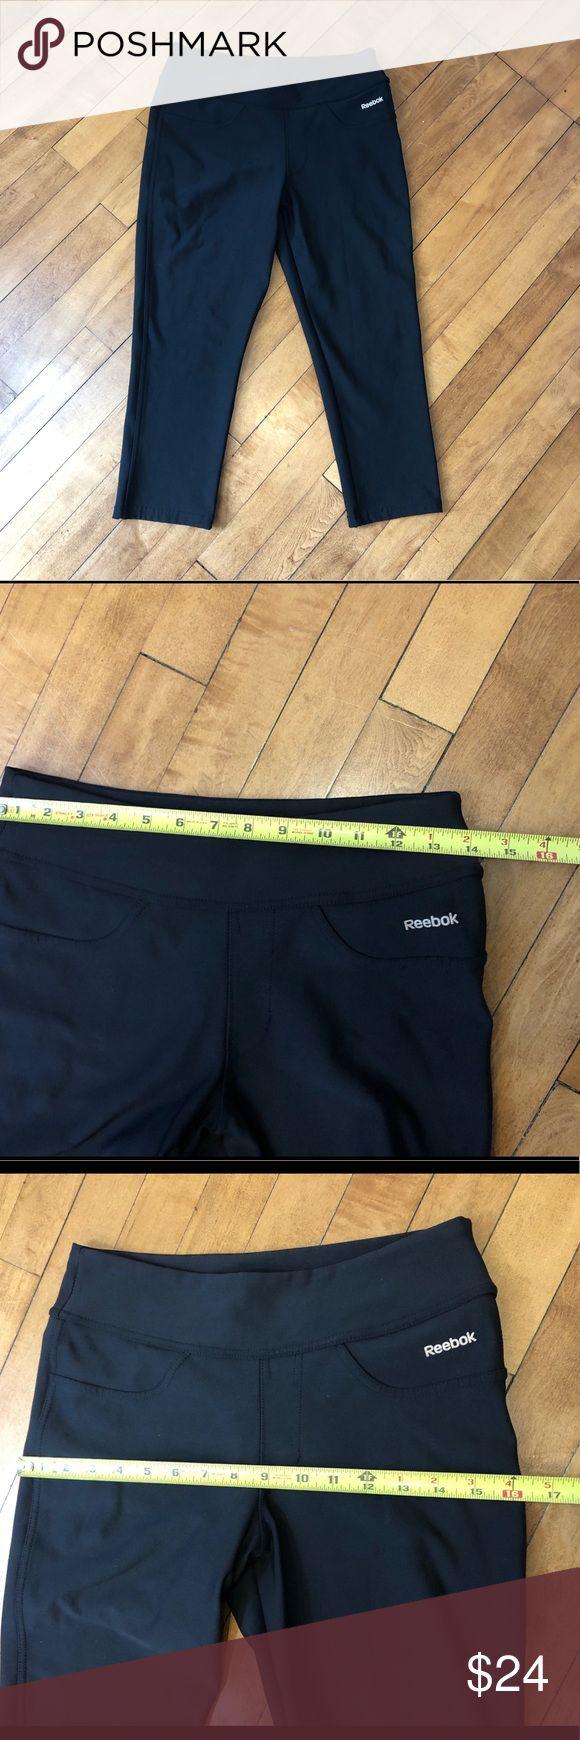 Reebok EasyTone Black Capri workout Pants Sz Sm This Reebok fitnesspants for wom…